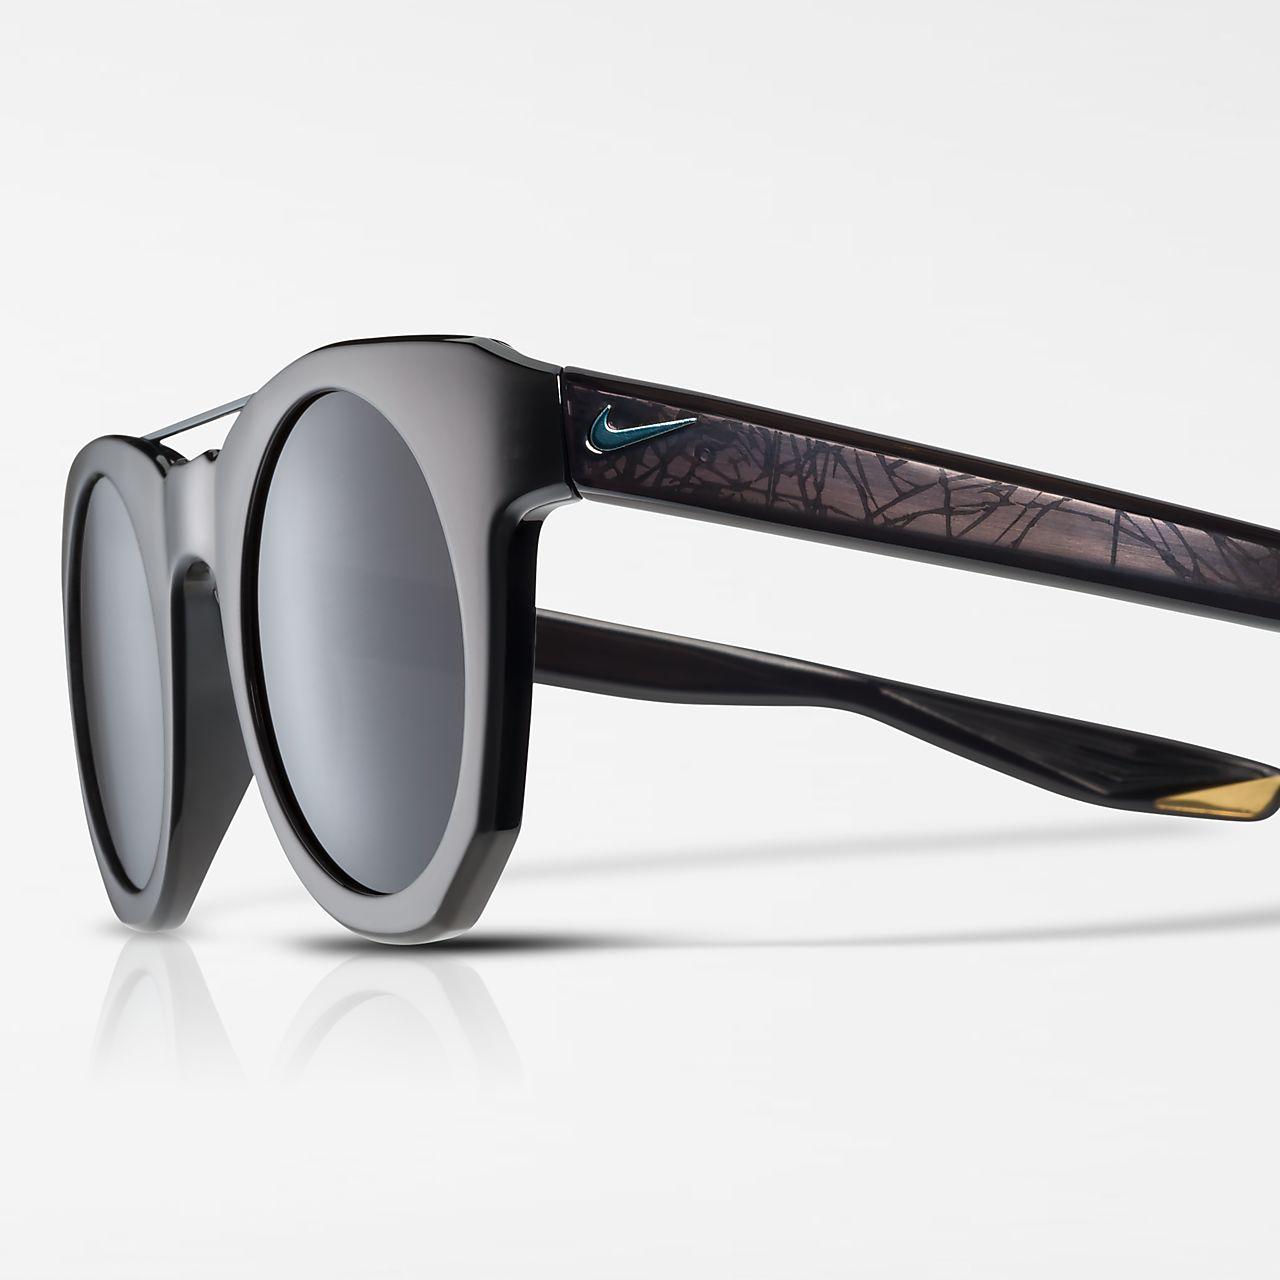 Nike KD Flicker Mirrored Sunglasses